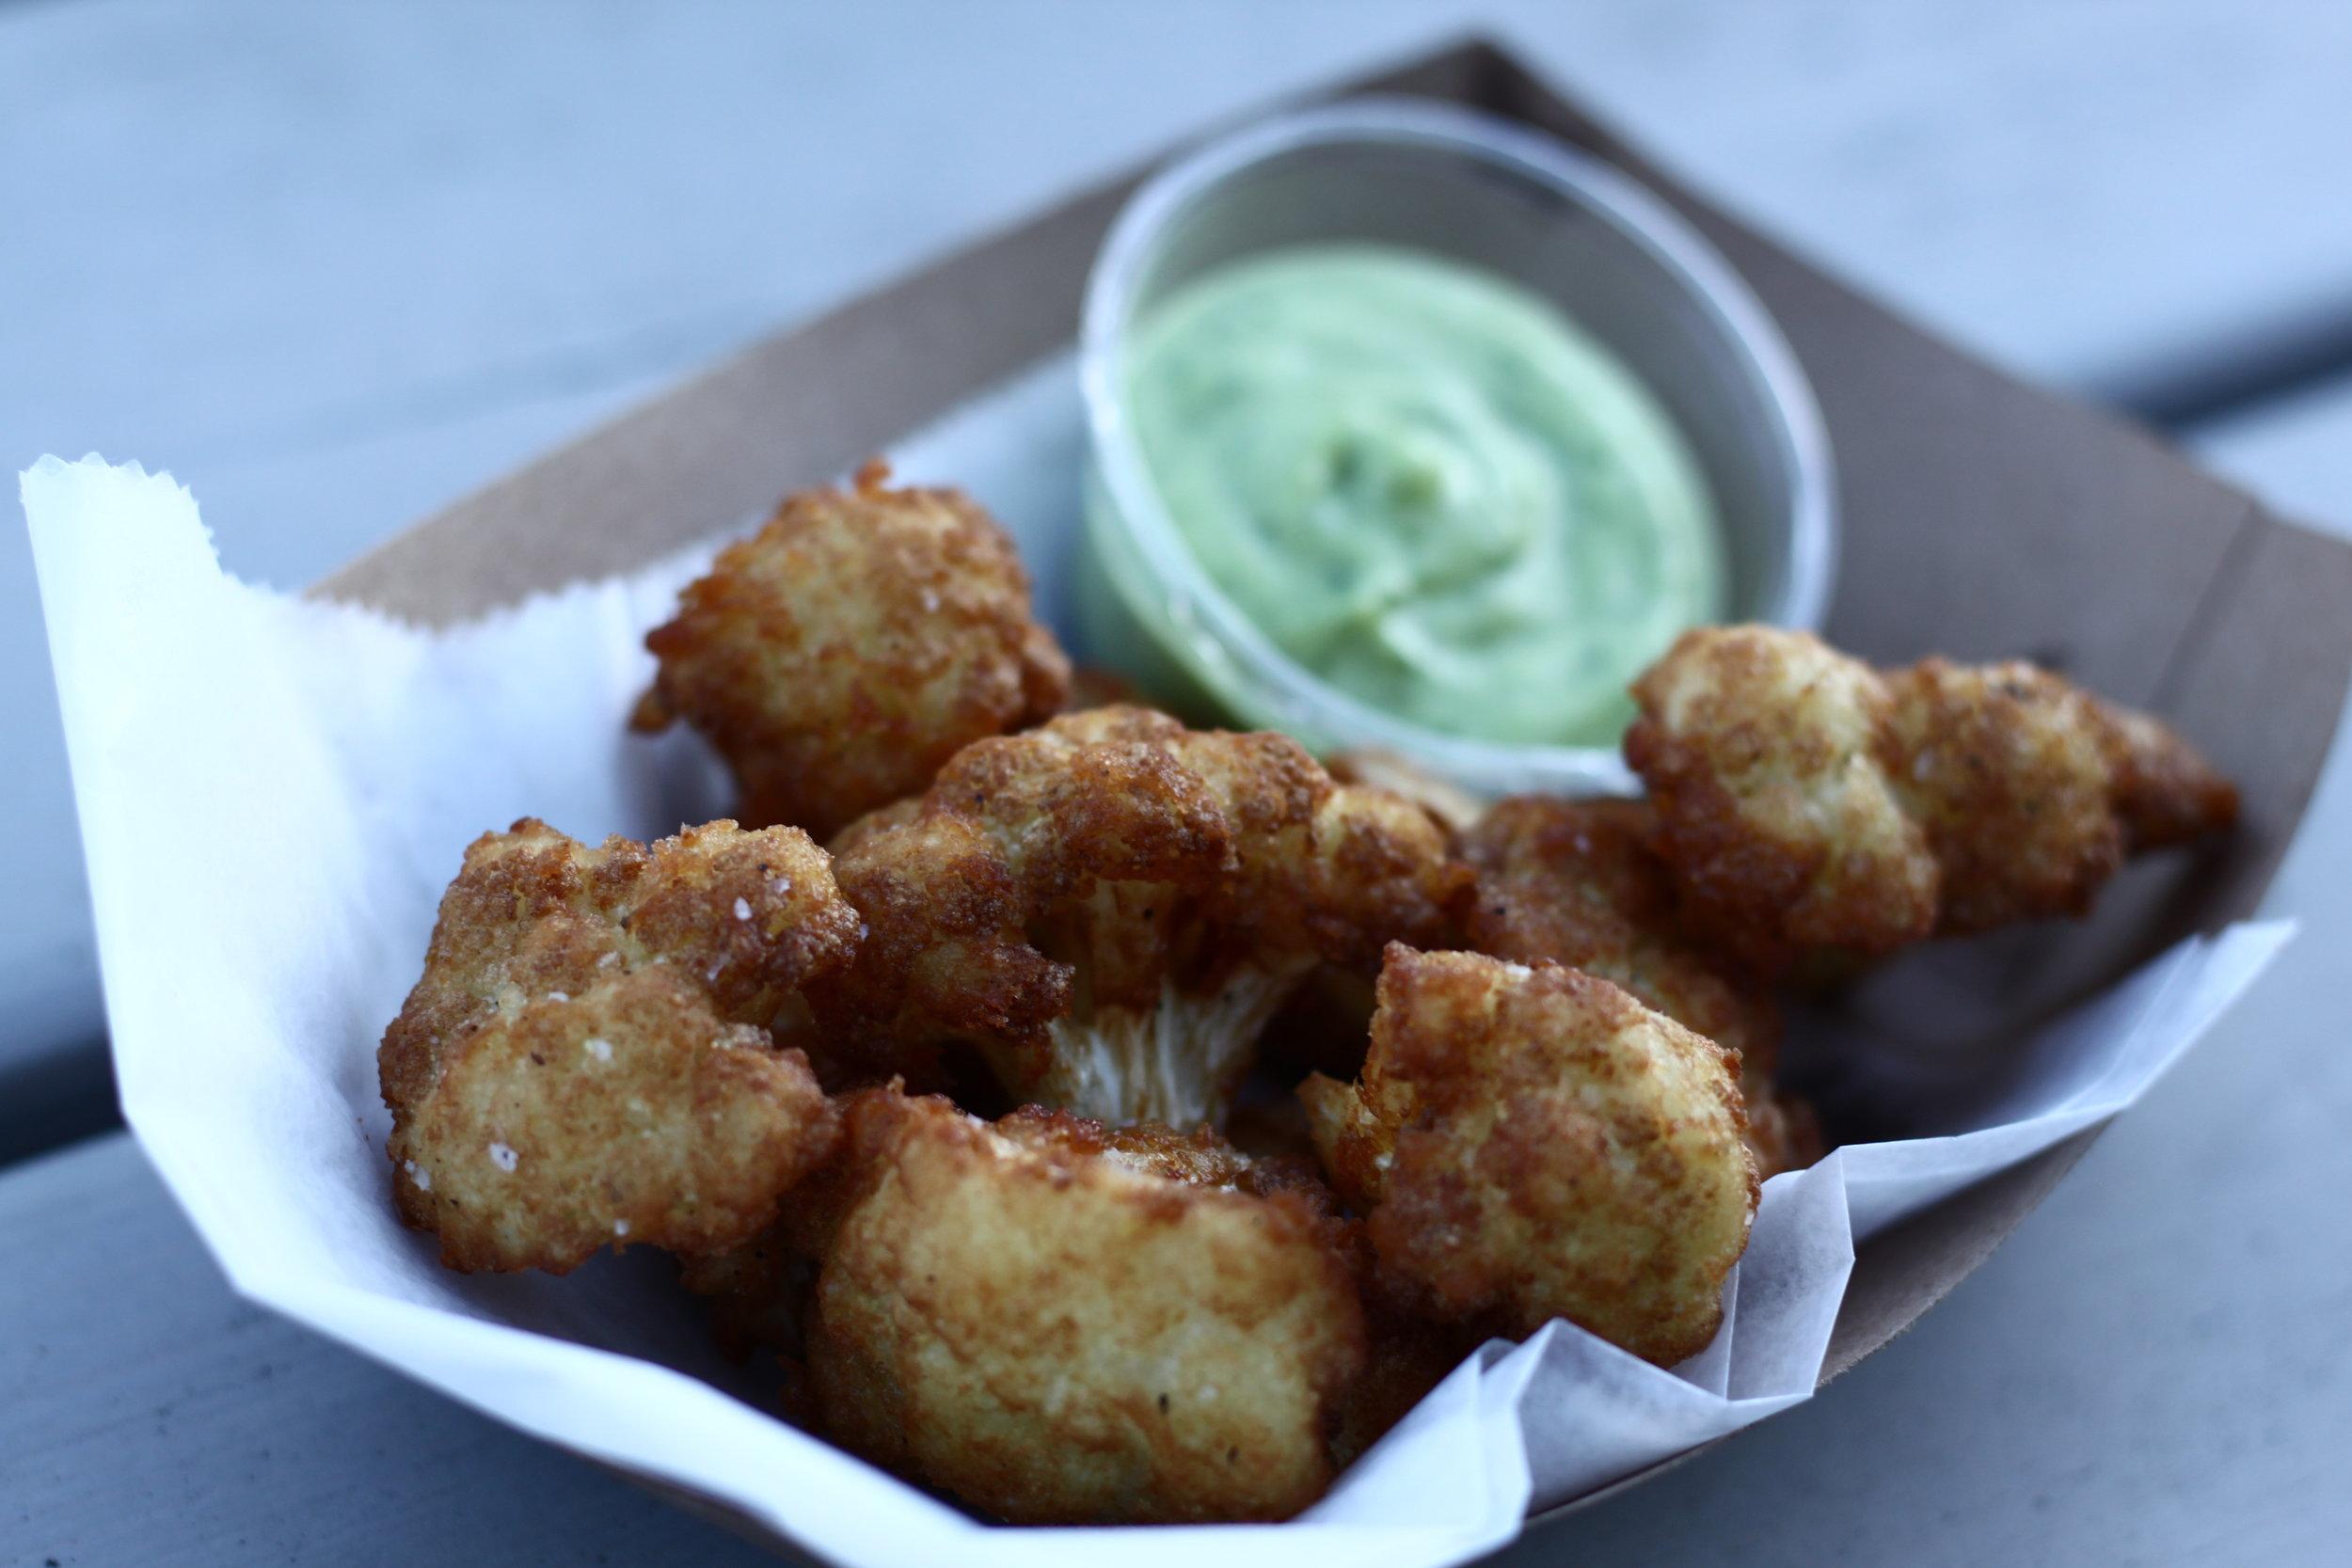 In fried cauliflower we trust.